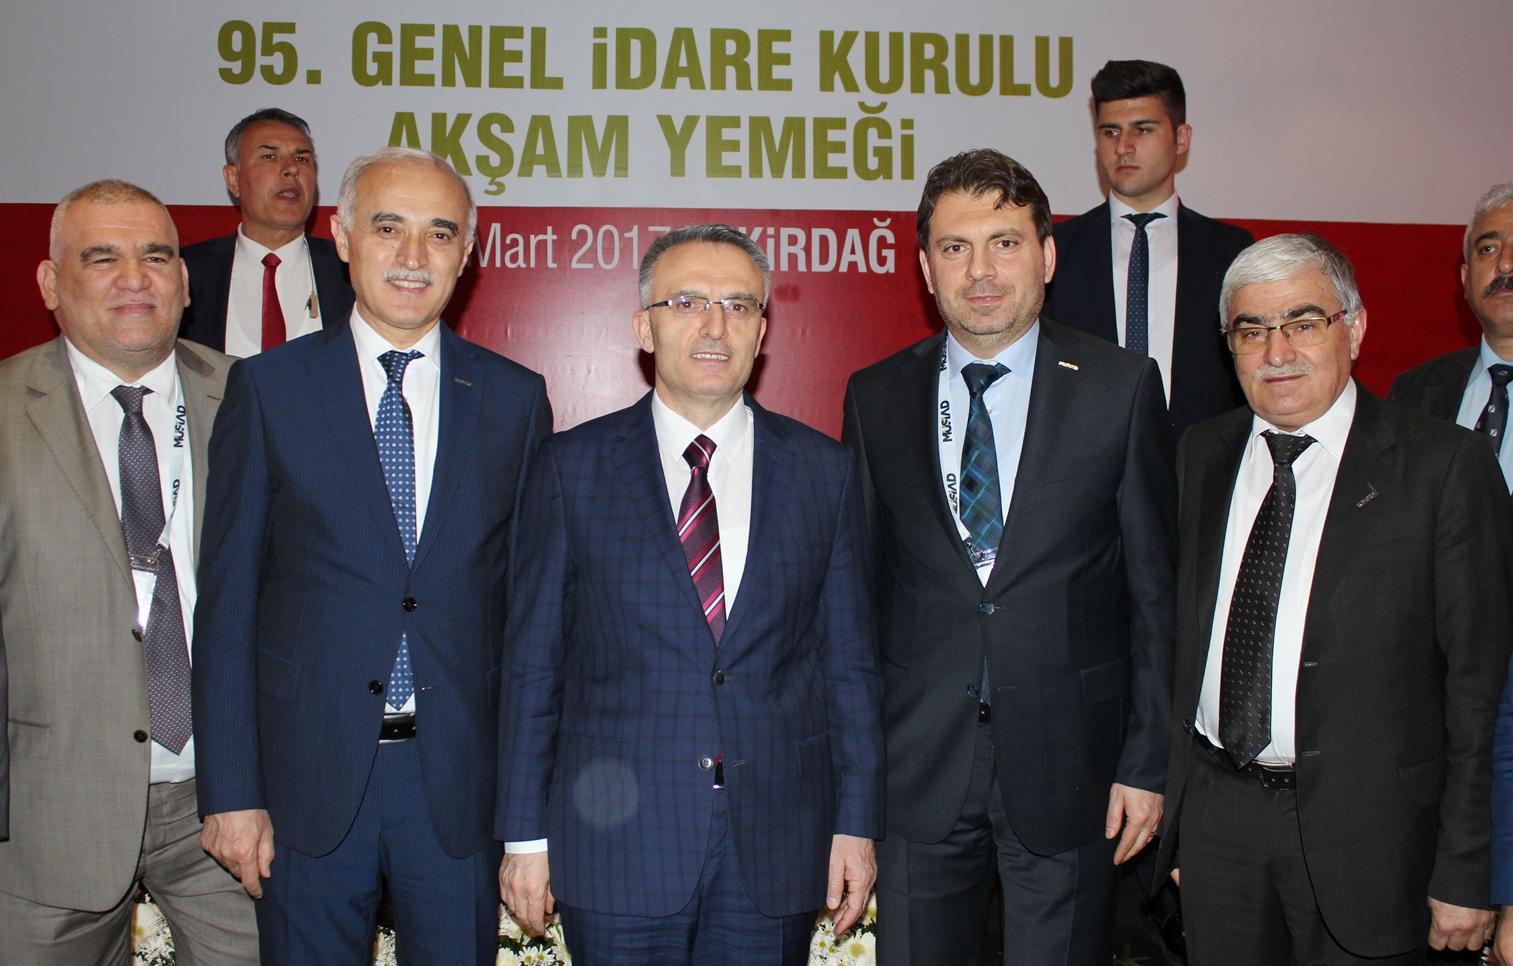 Başkan Yaşar Coşkun, Bakan Naci Ağbal'a dosya sundu…